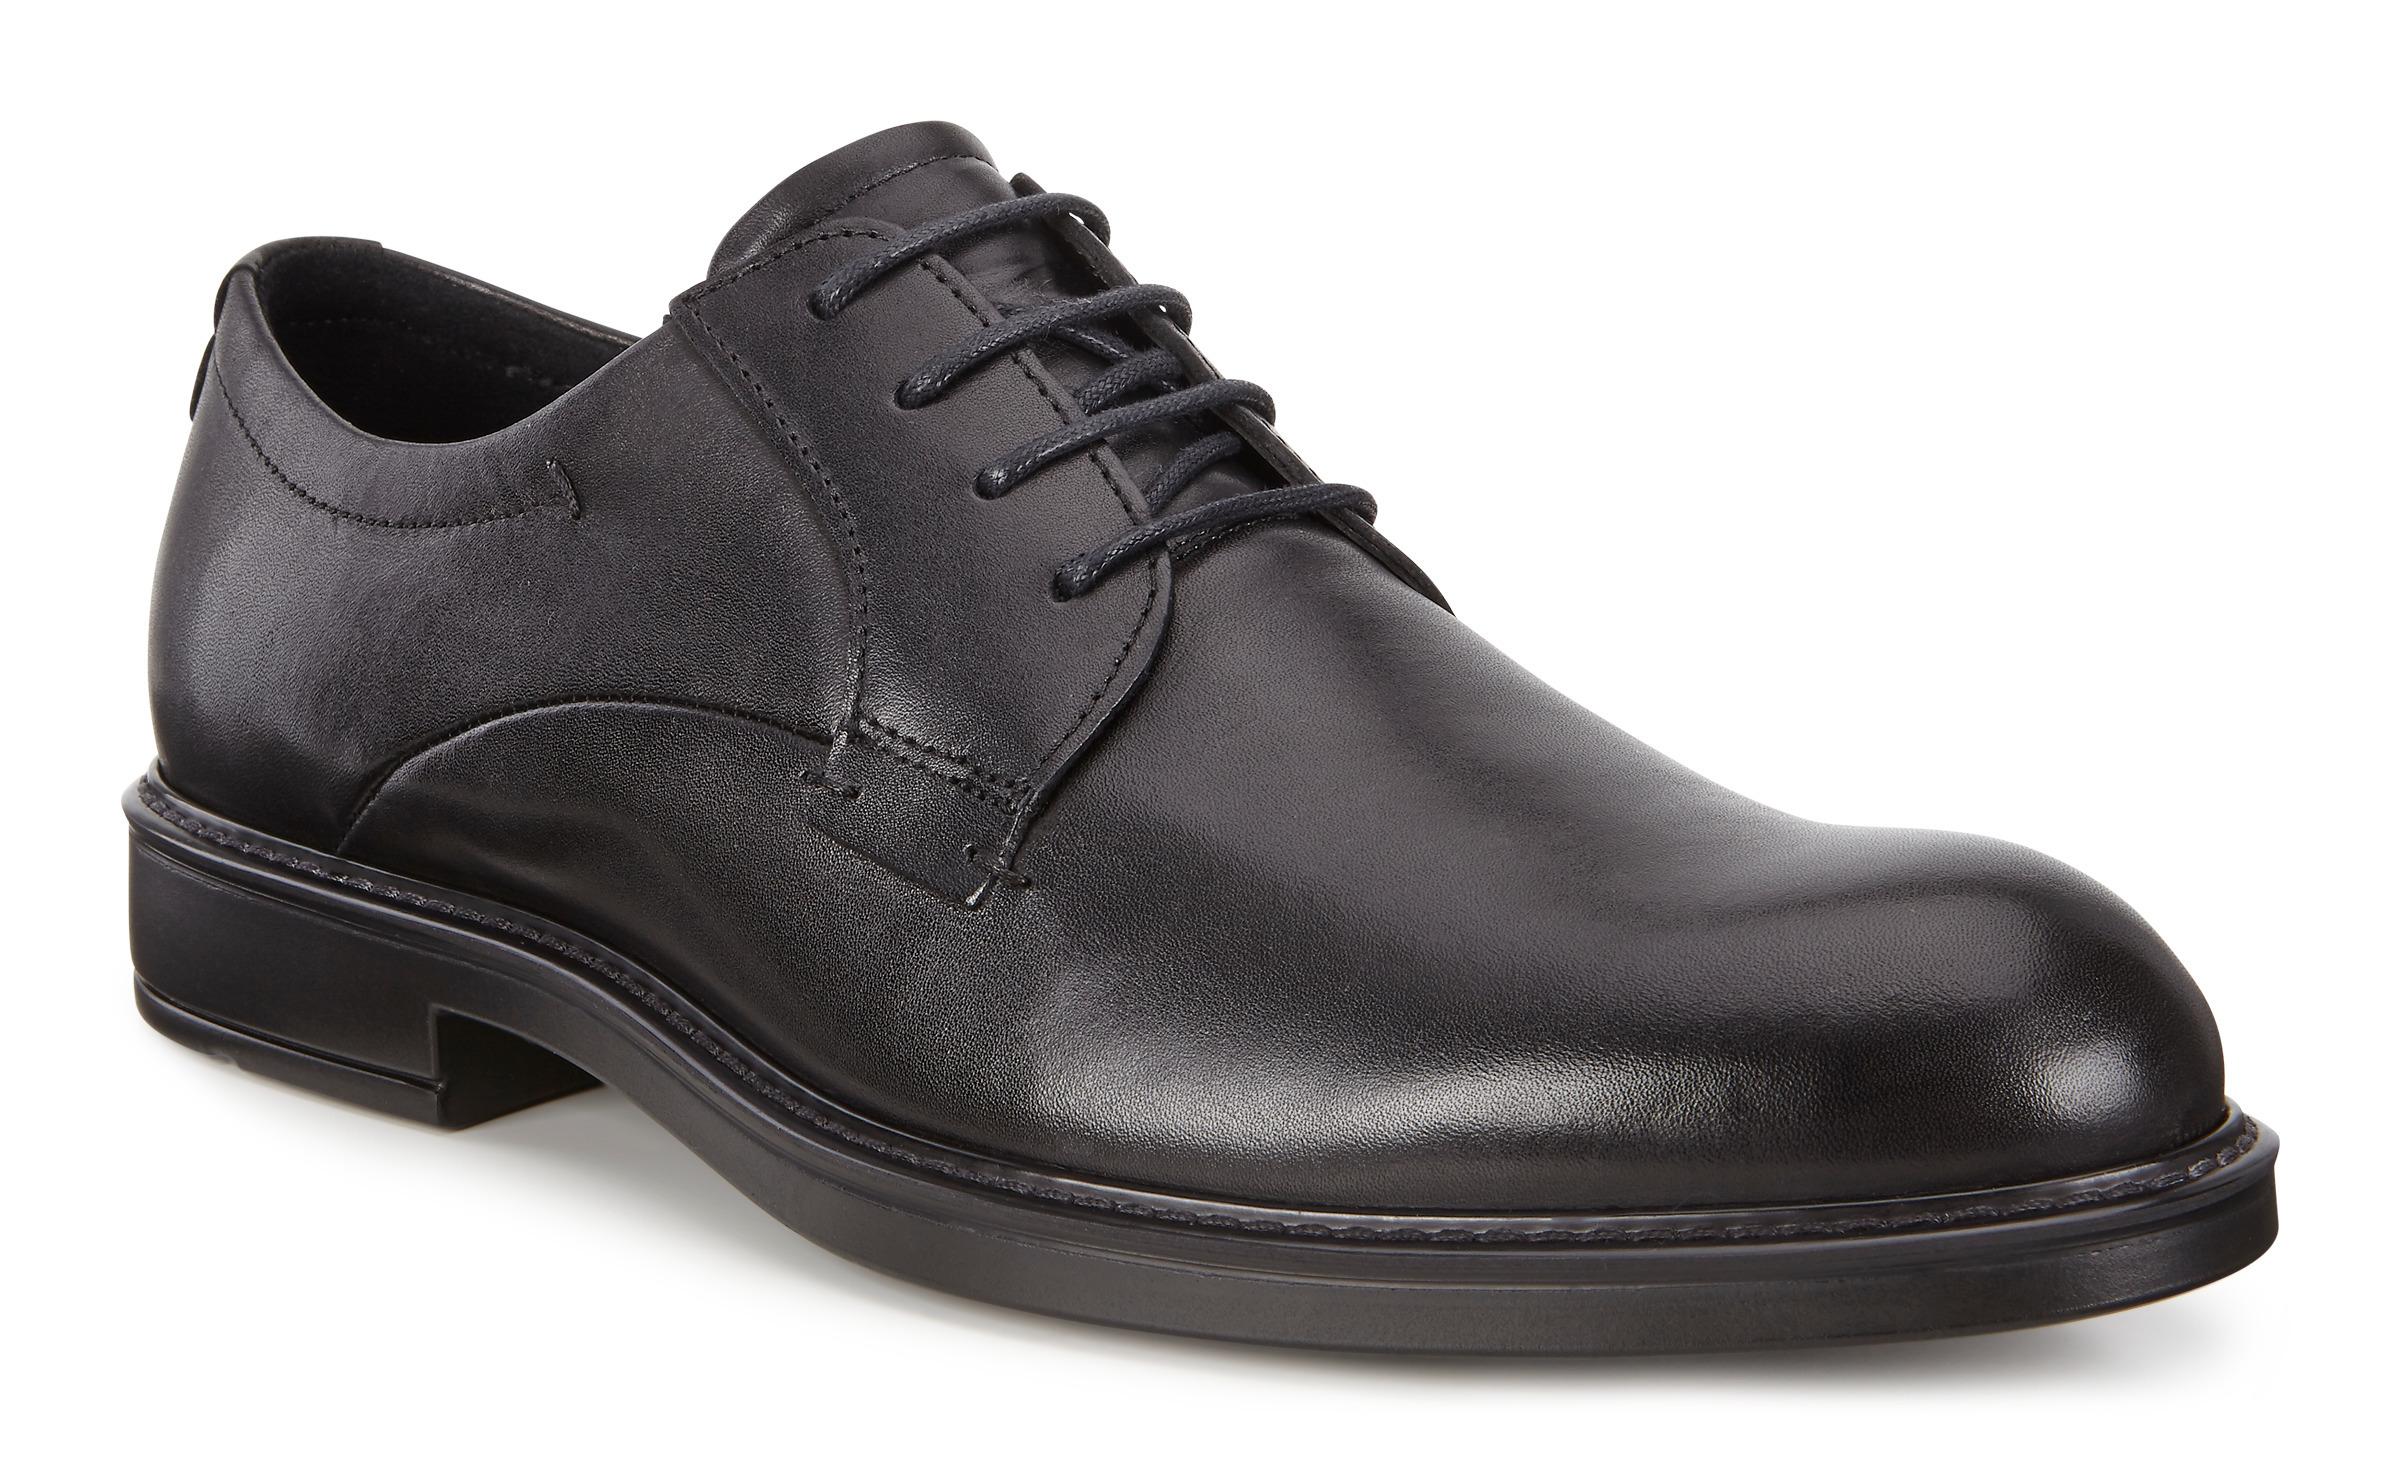 Herren Schuhe | Im offiziellen ECCO® Shop einkaufen